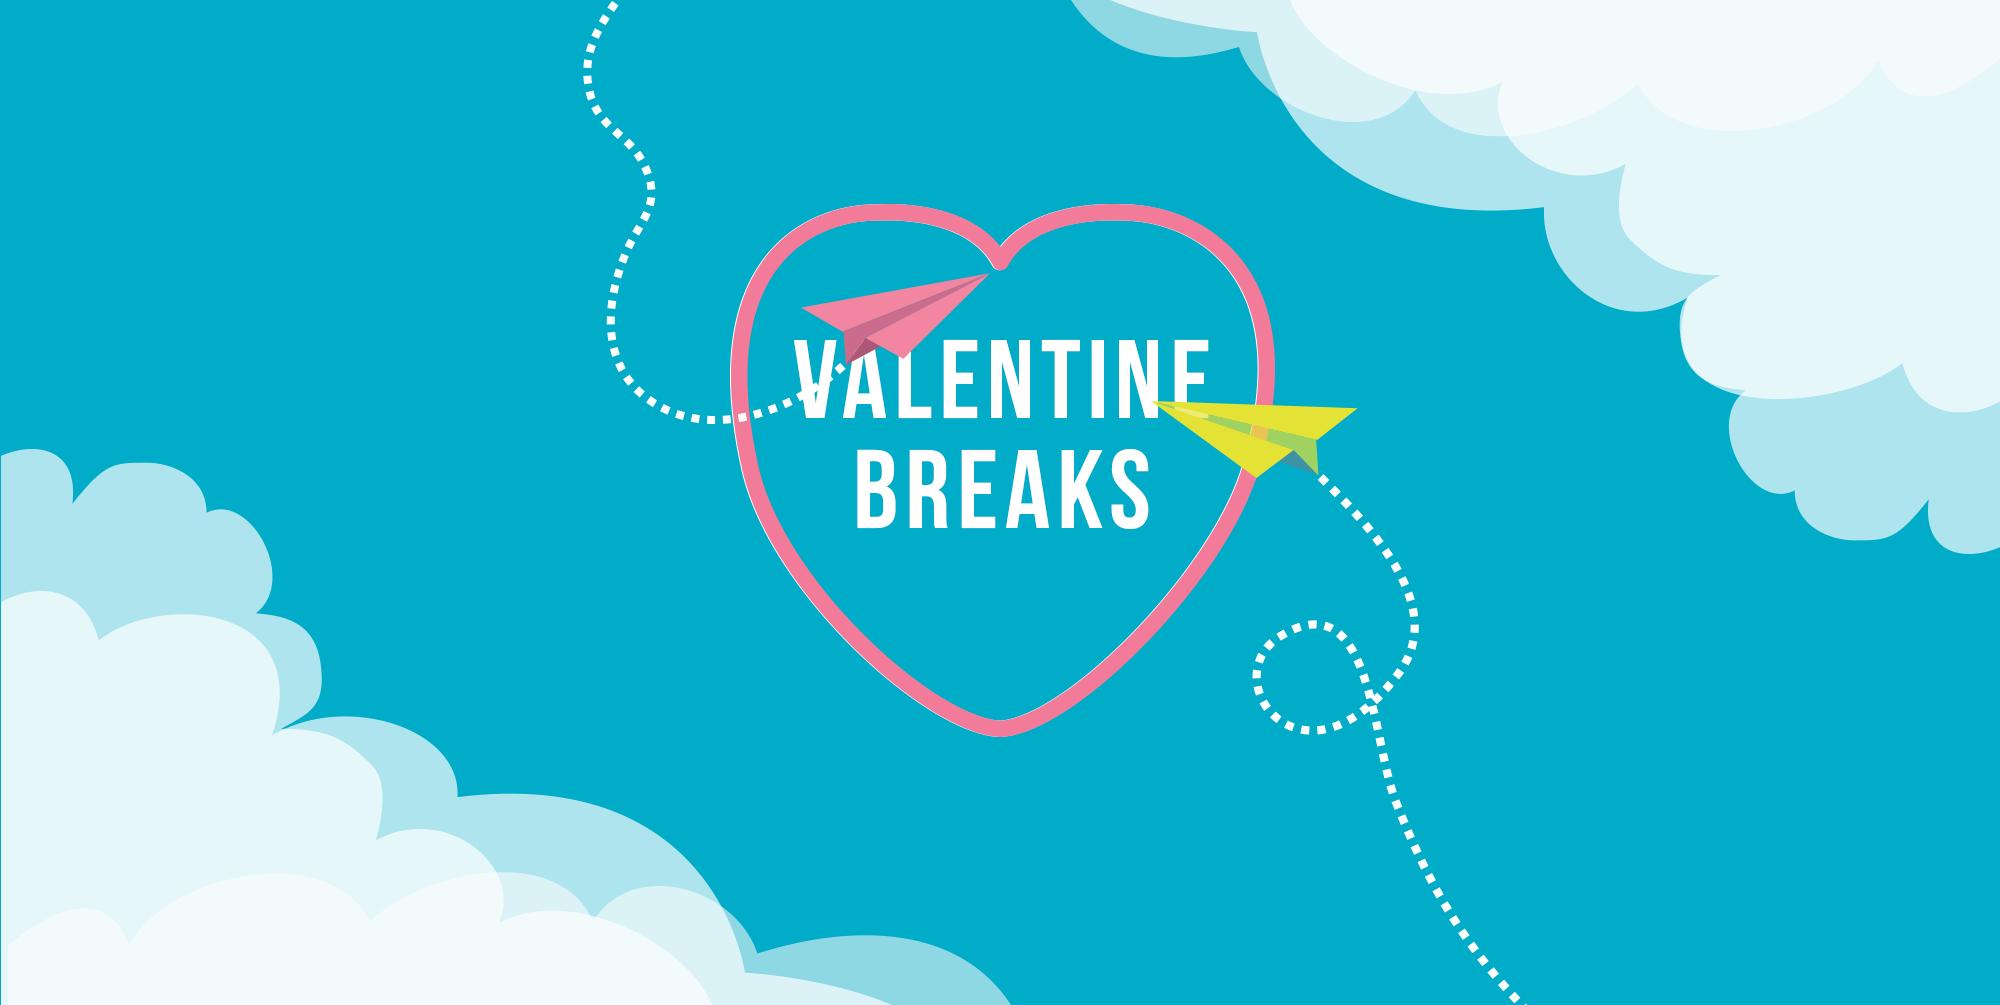 <p>Valentine Breaks</p>